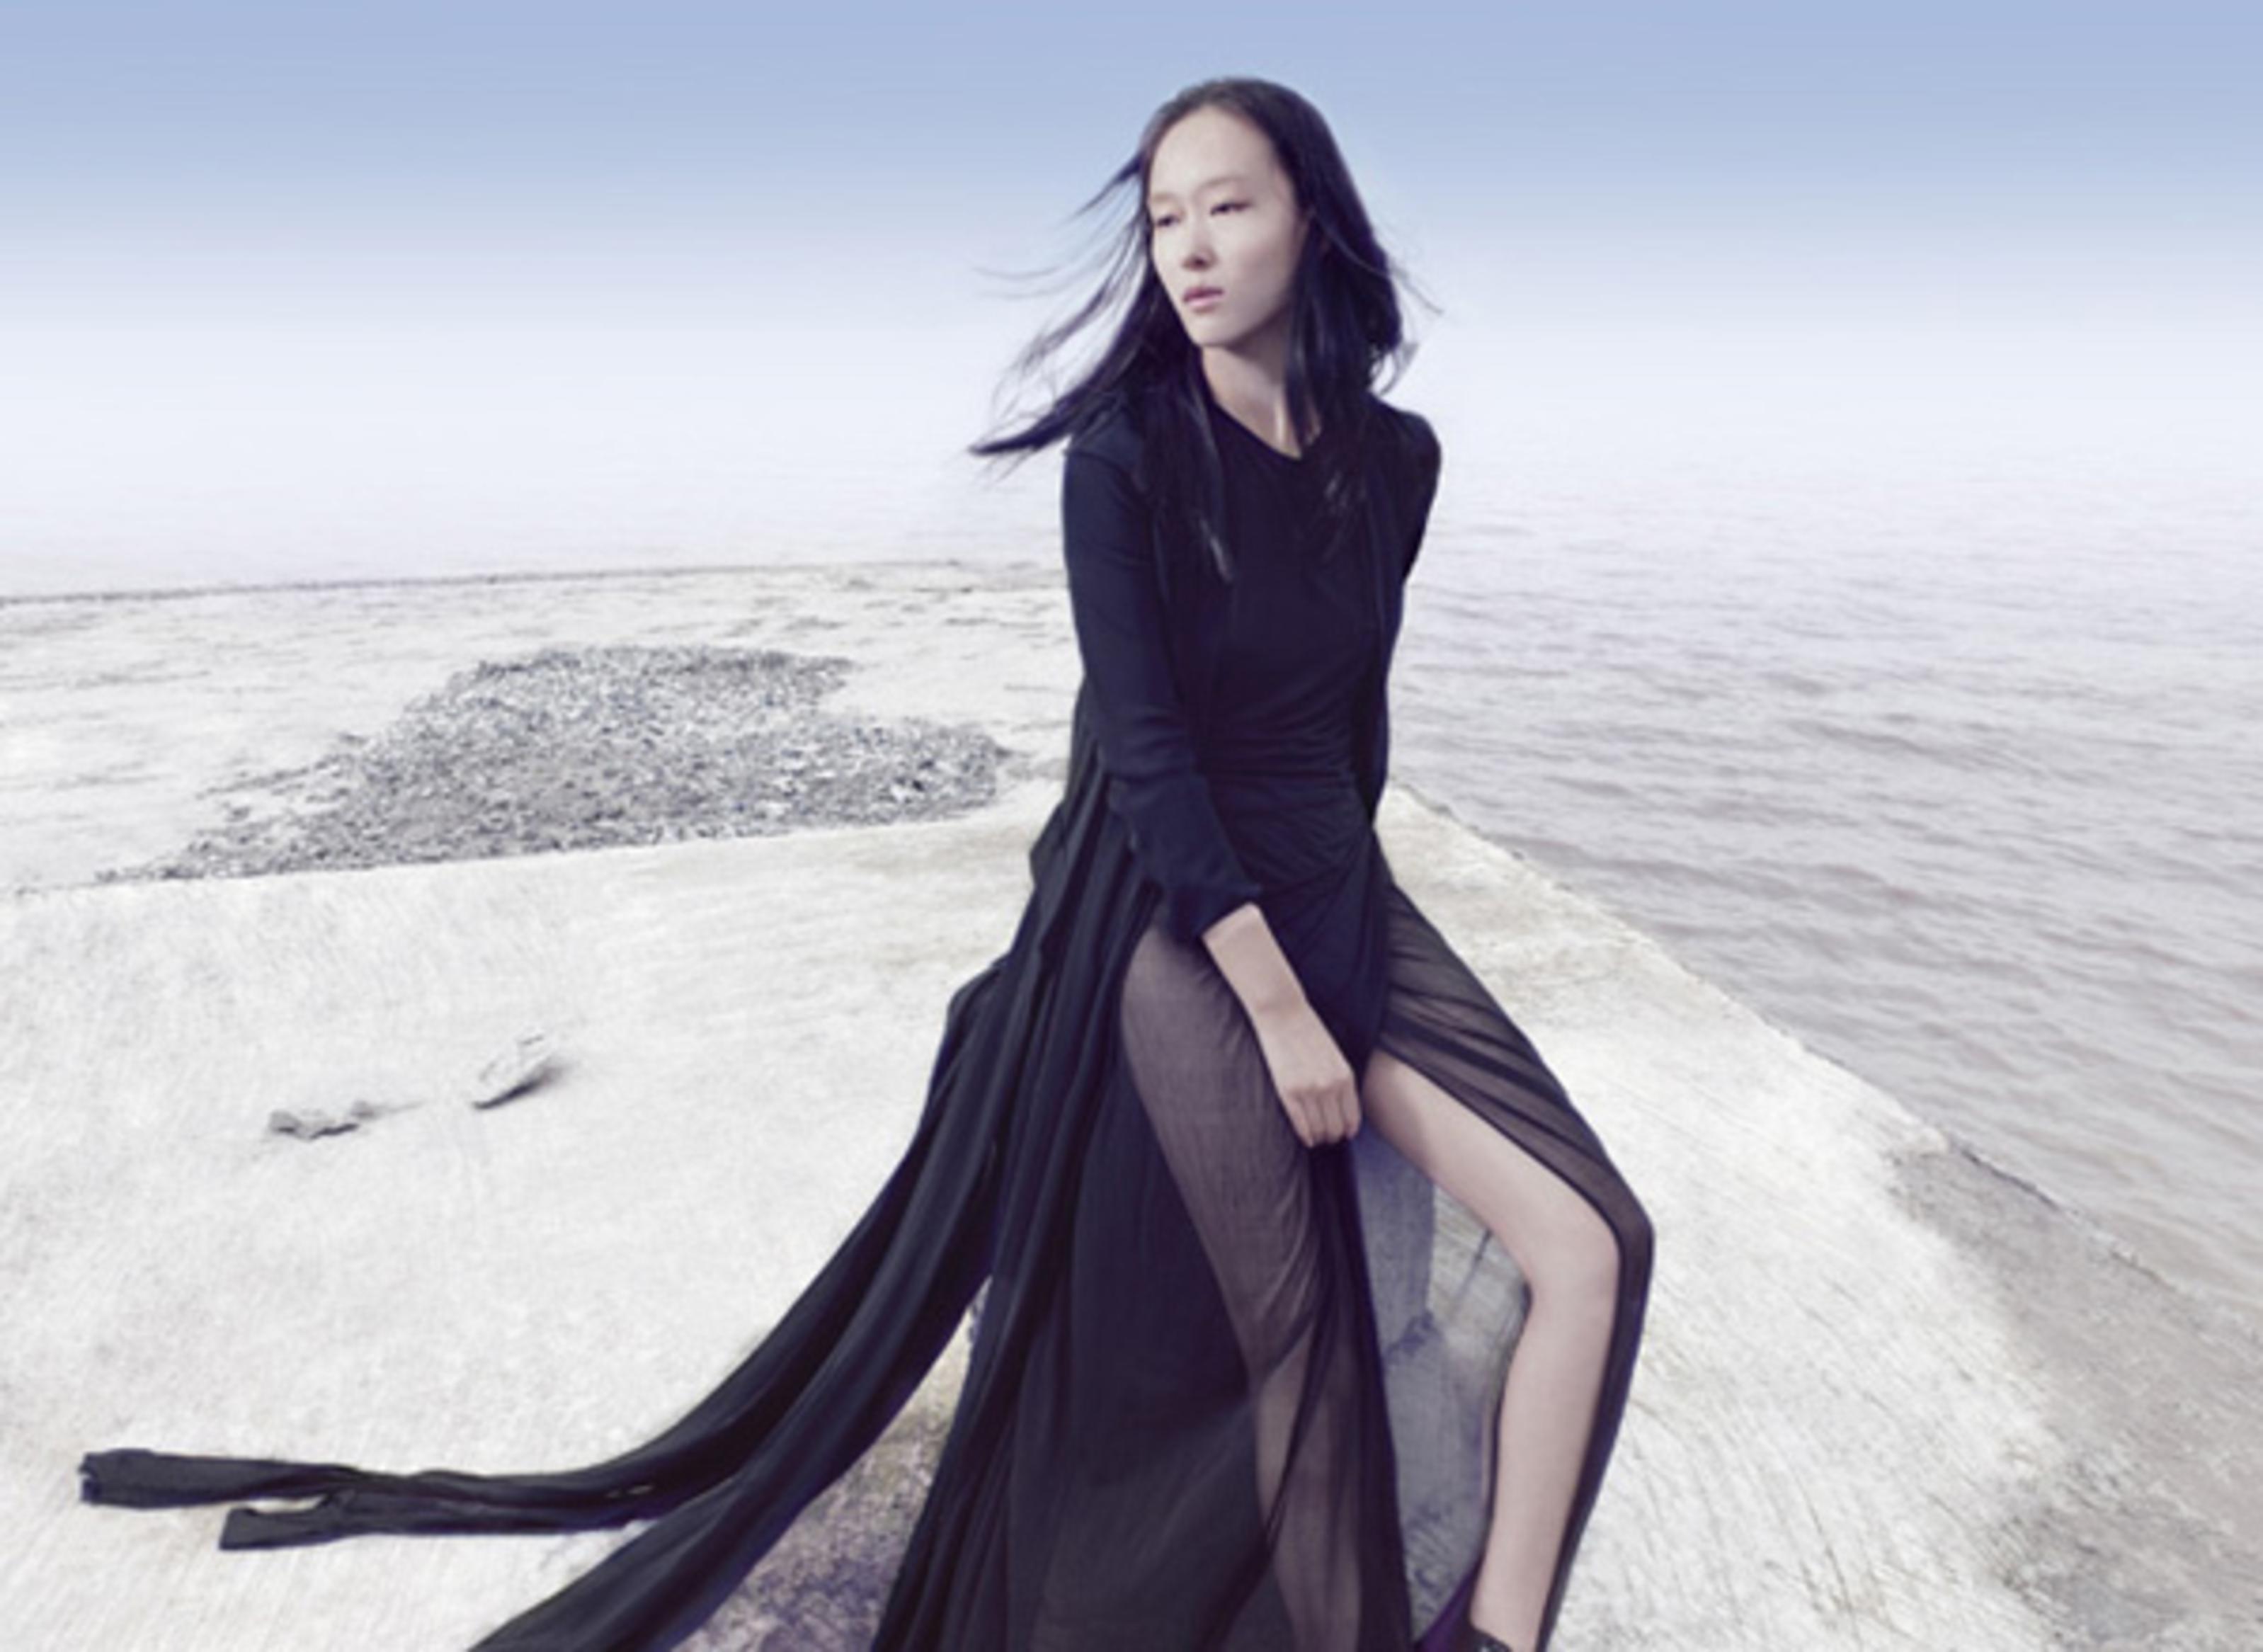 Qiu hao fashion designer 18